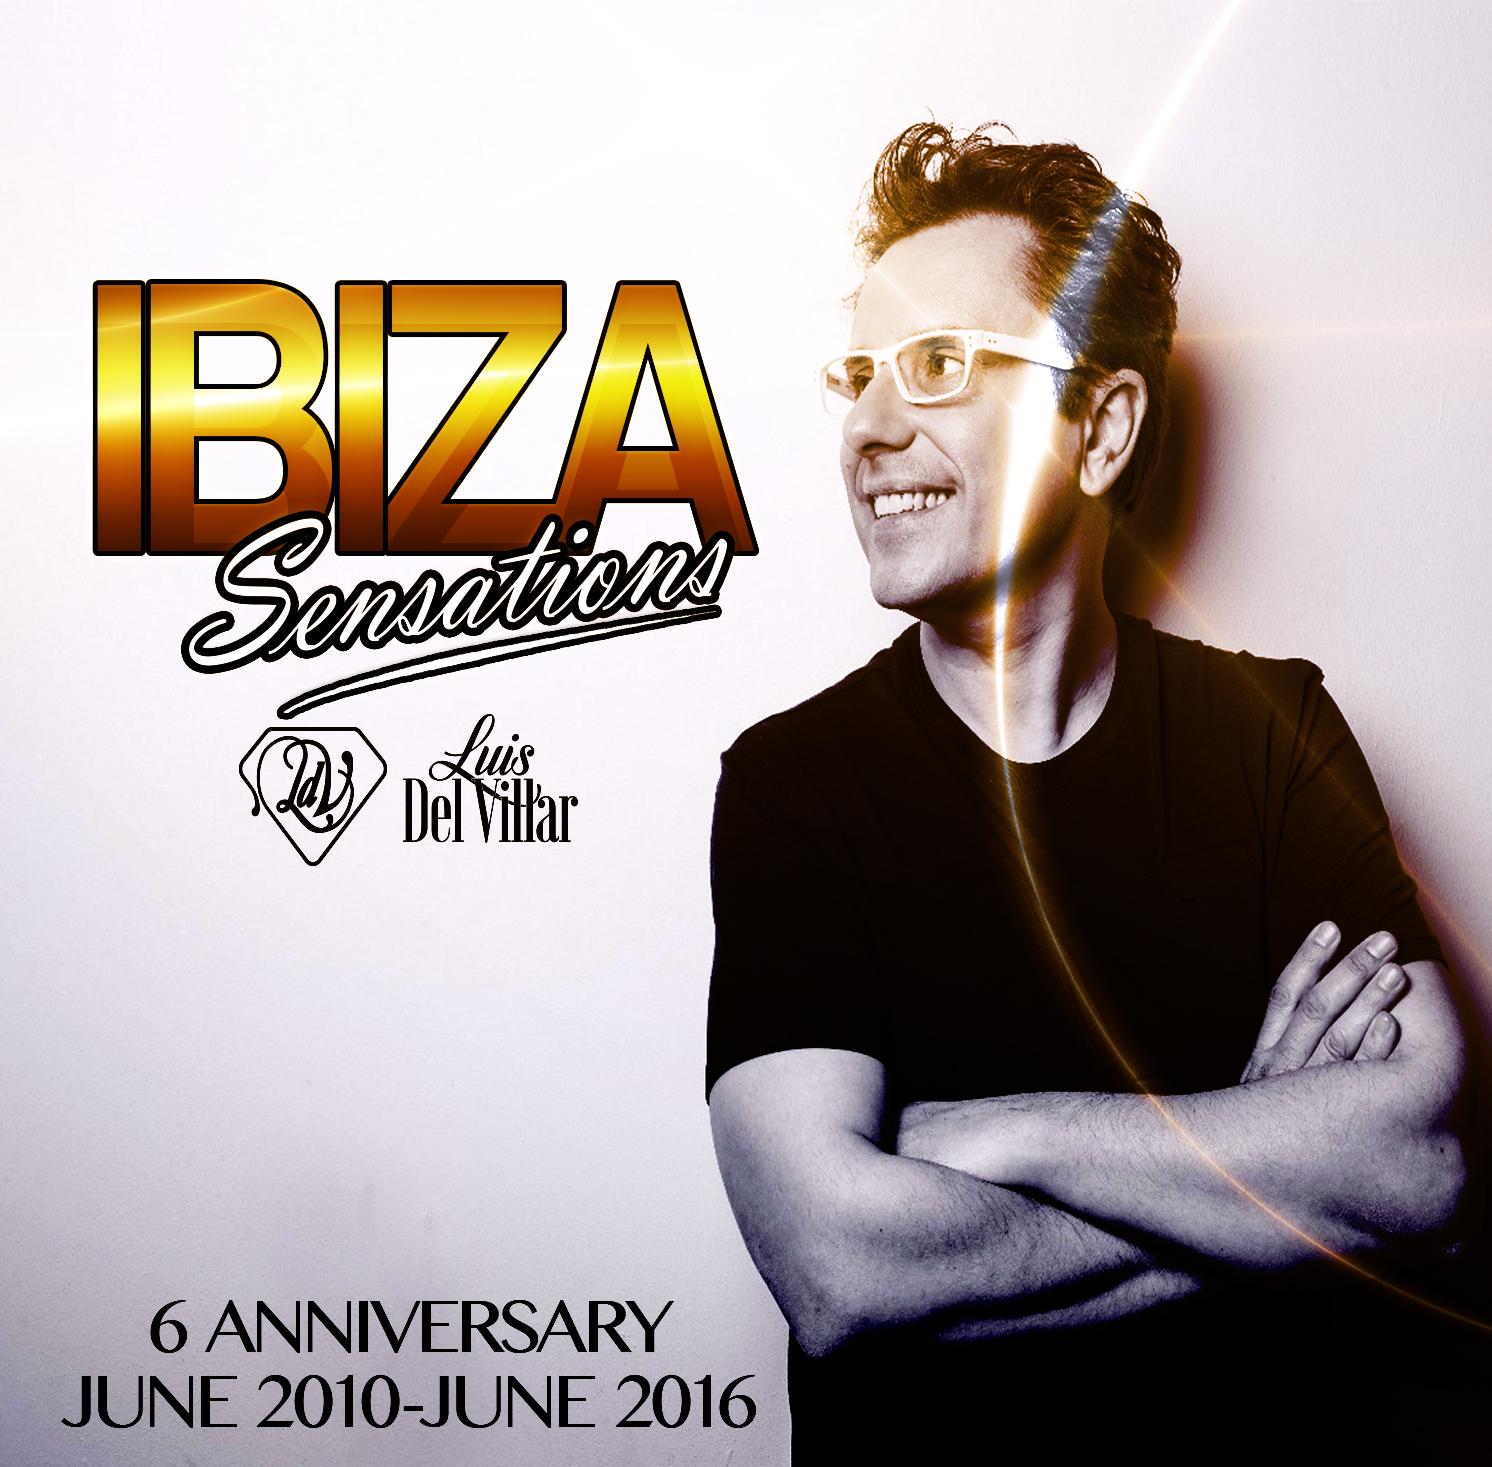 Ibiza Sensations 141 @ Chiringay - Ibiza Gay Pride june the 9th